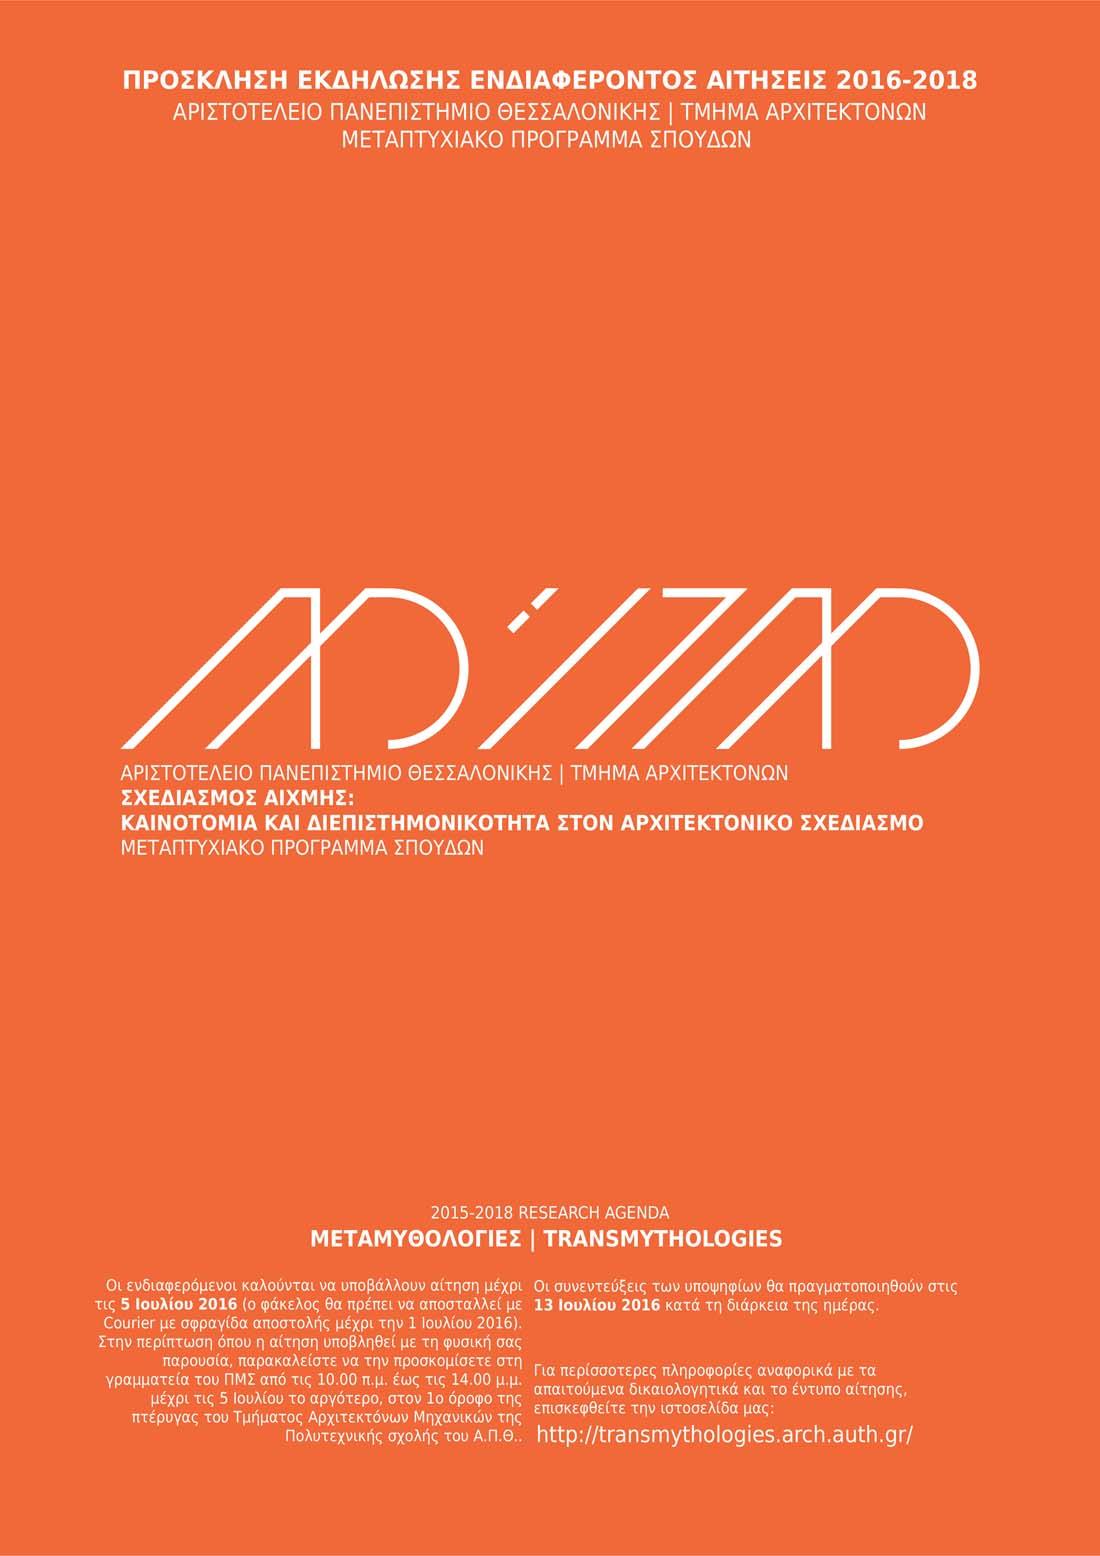 transmythologies POSTER 2016